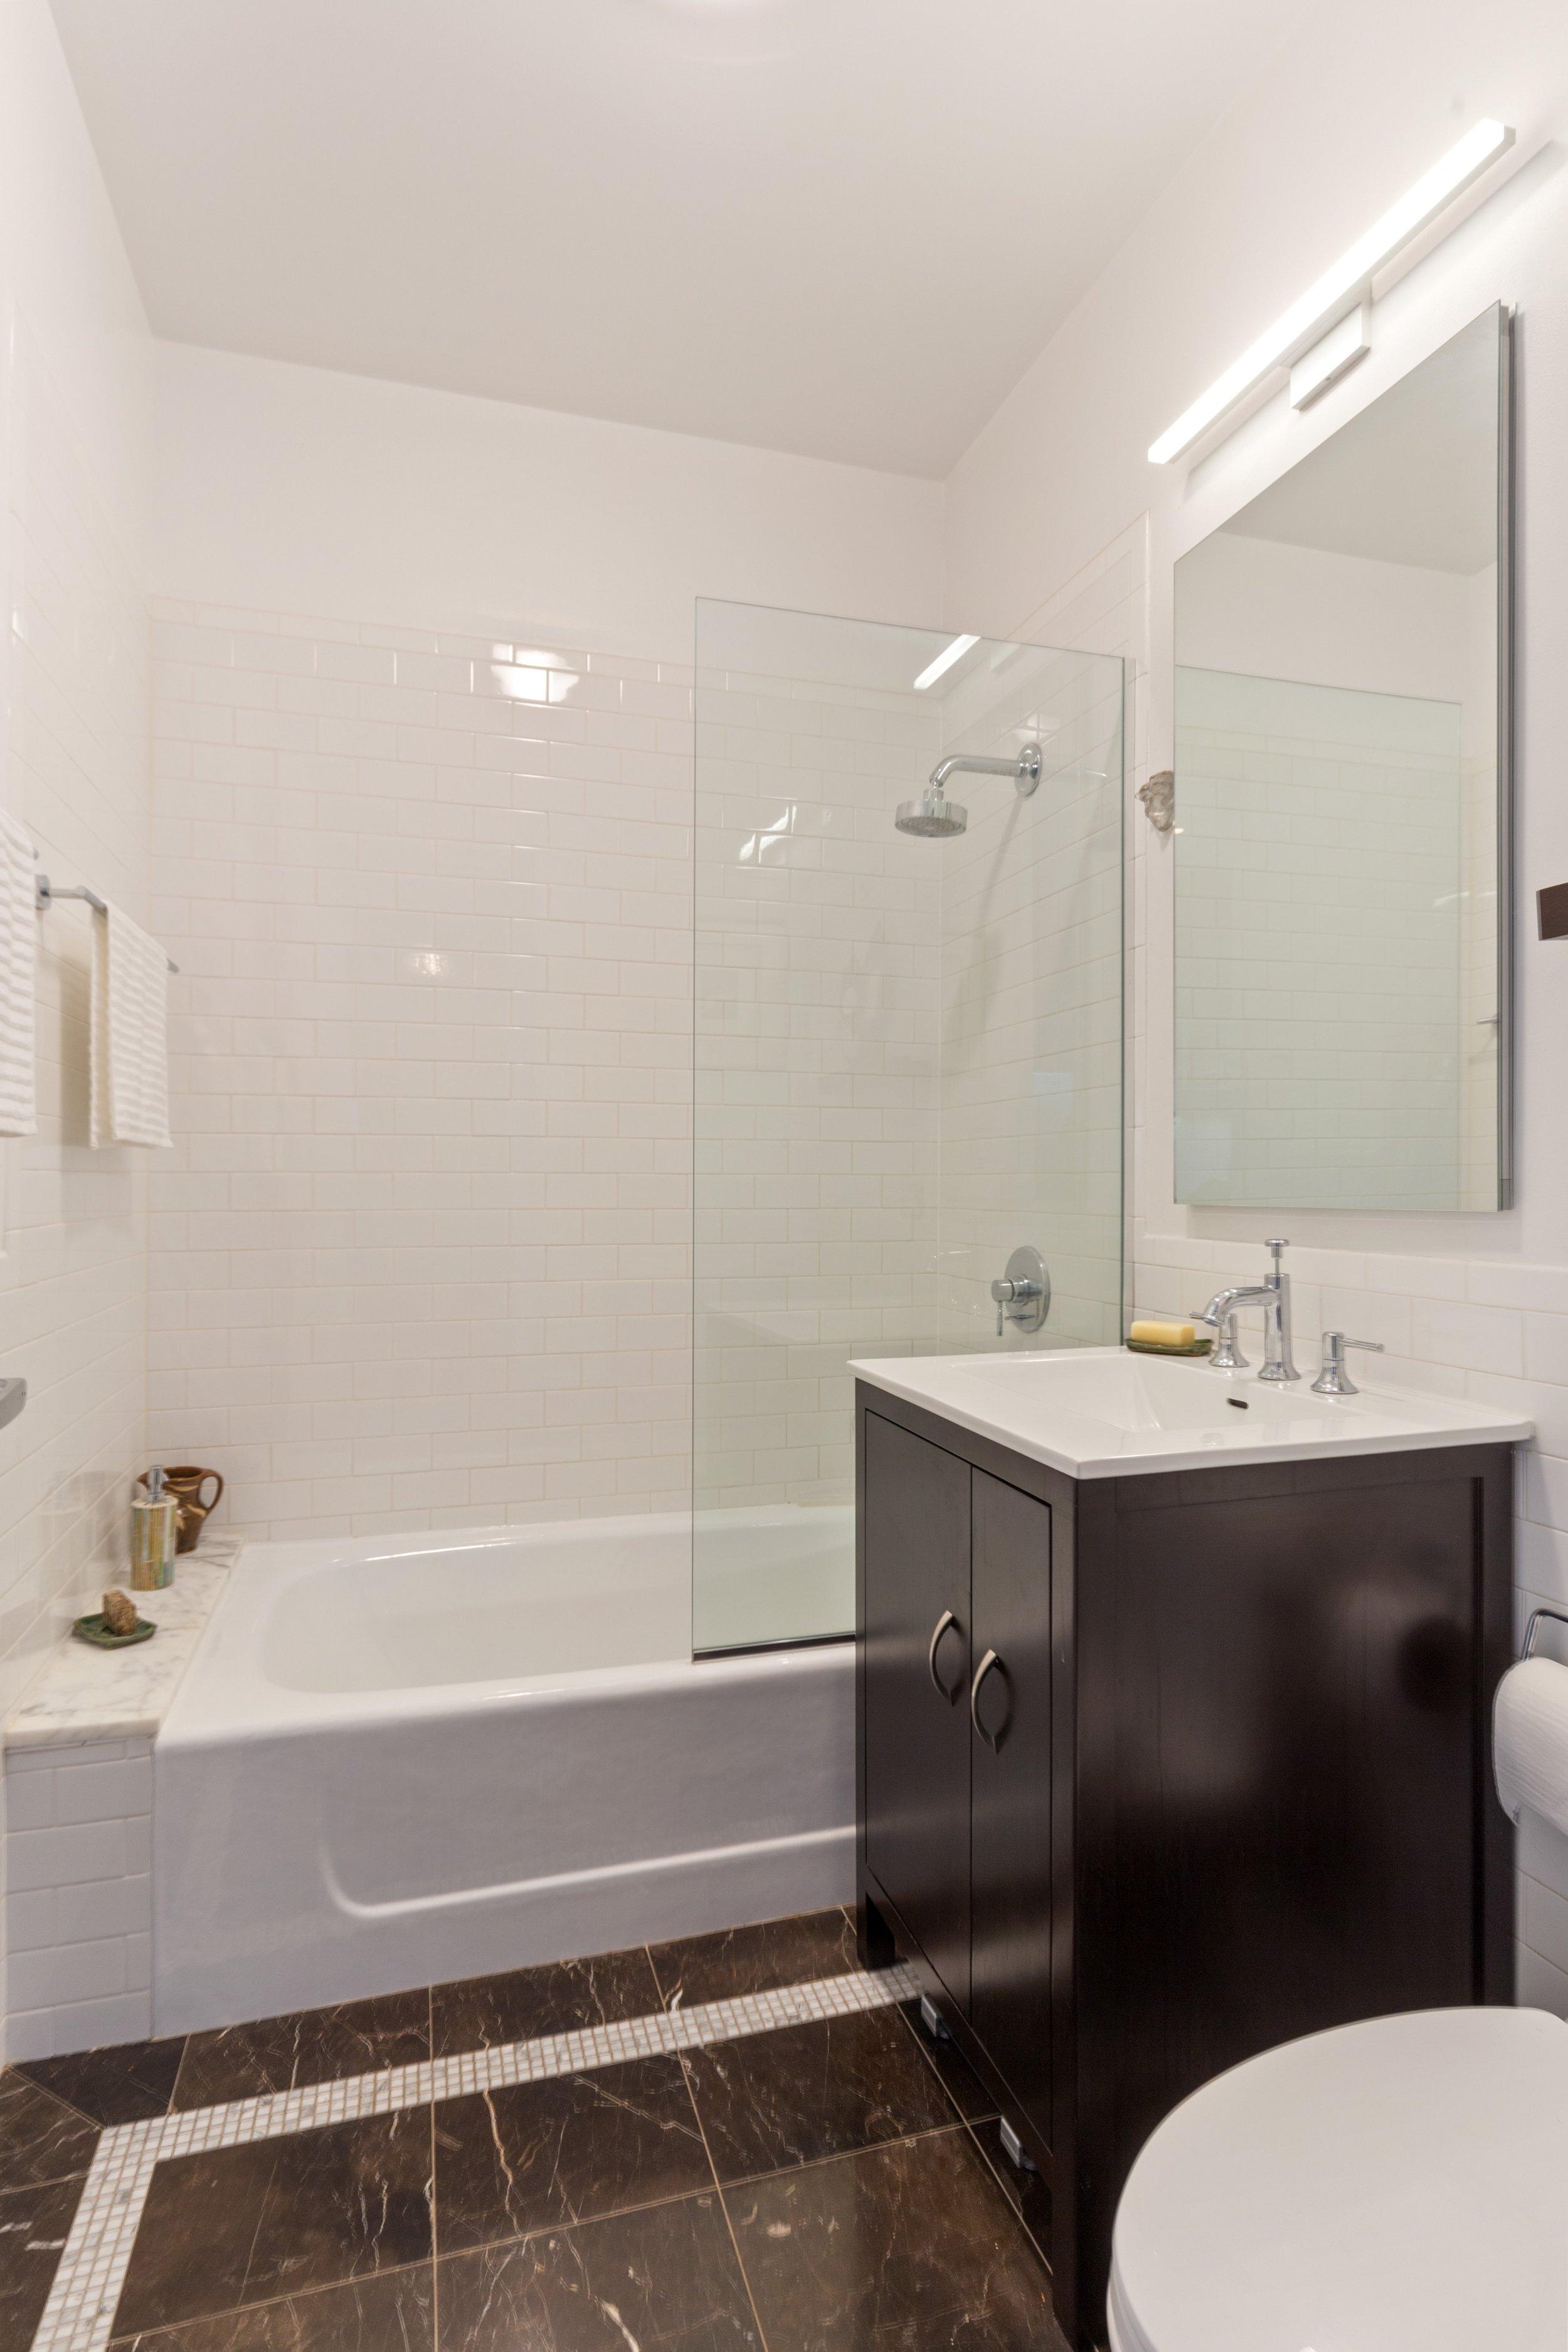 10_96Rockwell11C_8_Bathroom_HiRes.jpg